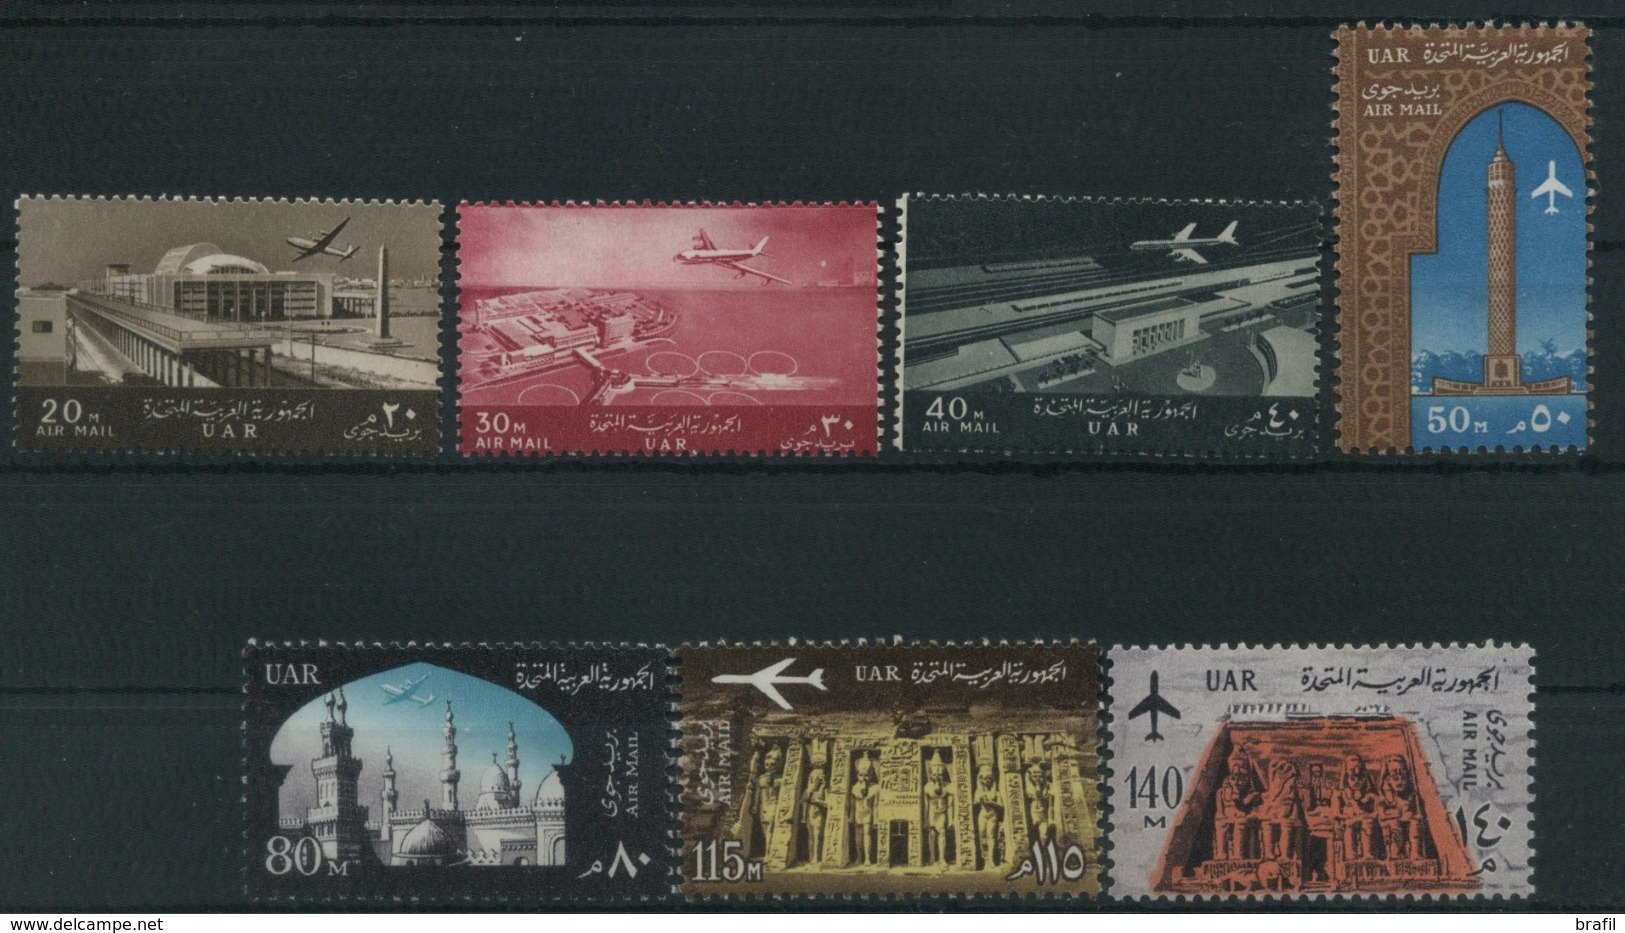 1963/4 Egitto, Posta Aerea, Serie Completa Nuova (**) - Posta Aerea